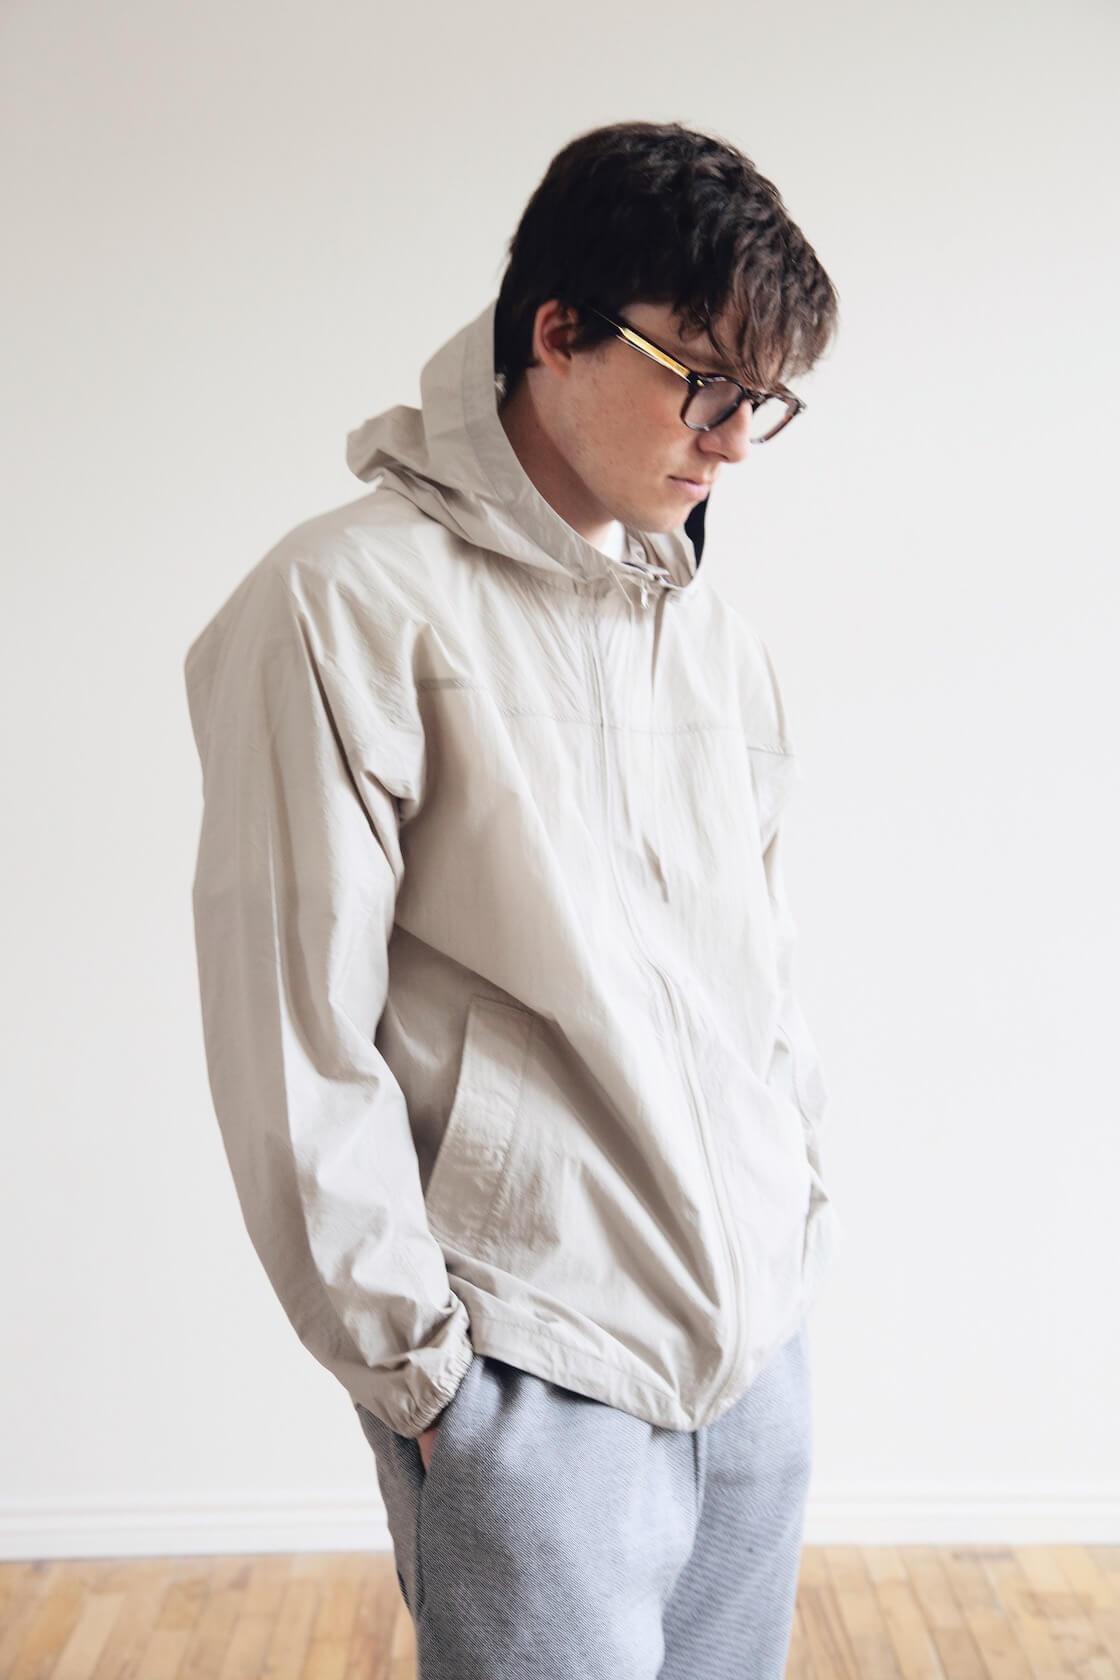 nanamica cruiser jacket, byborre tapered crop pants and visvim fkt runner shoes on body